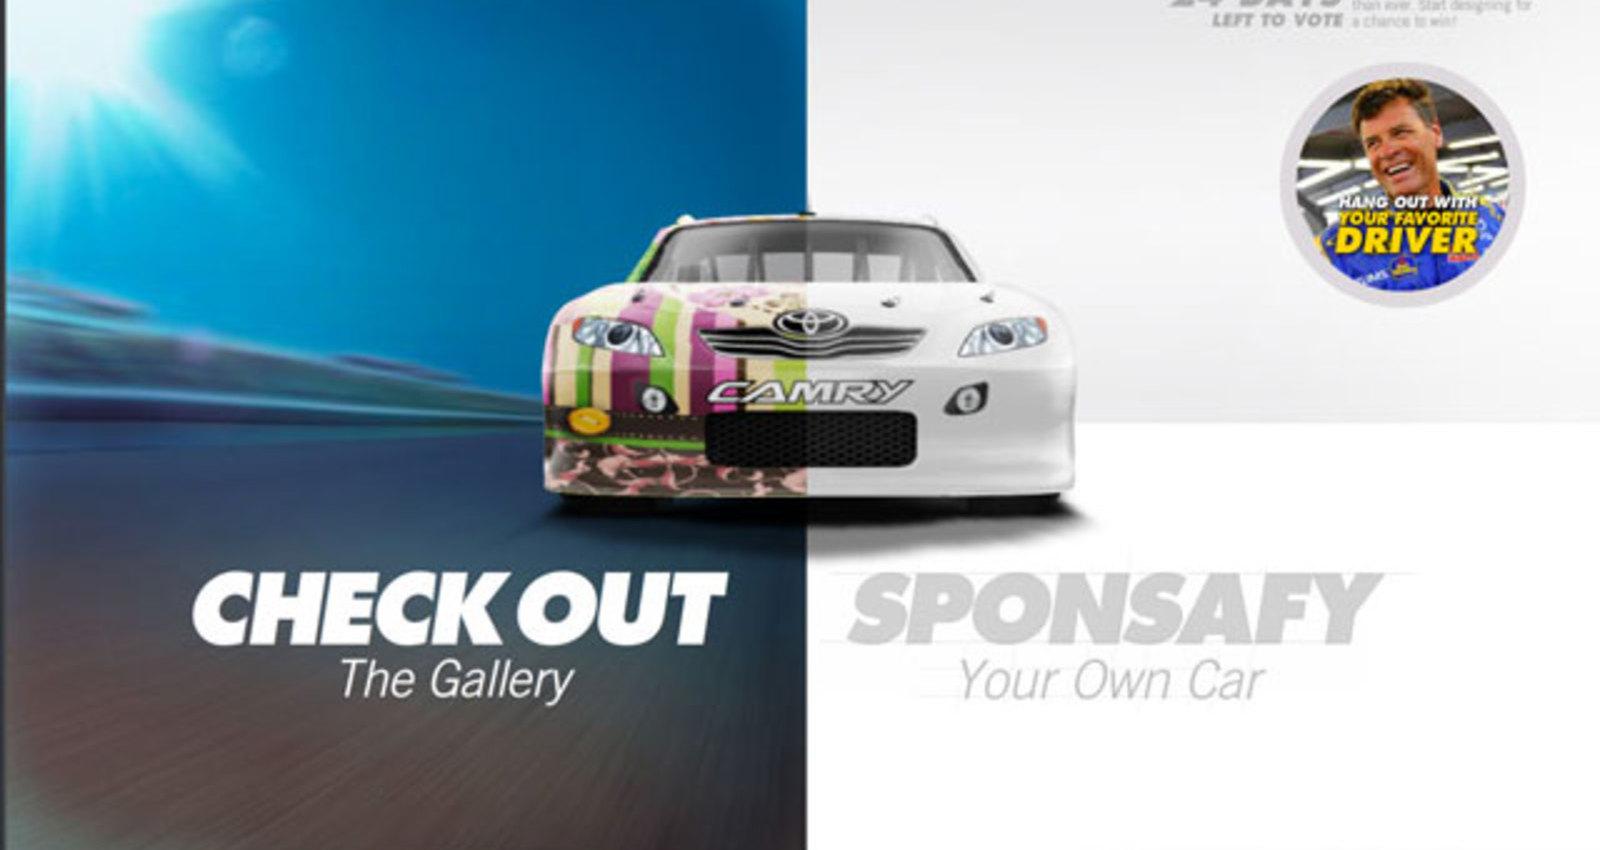 Sponsafier 3 Campaign